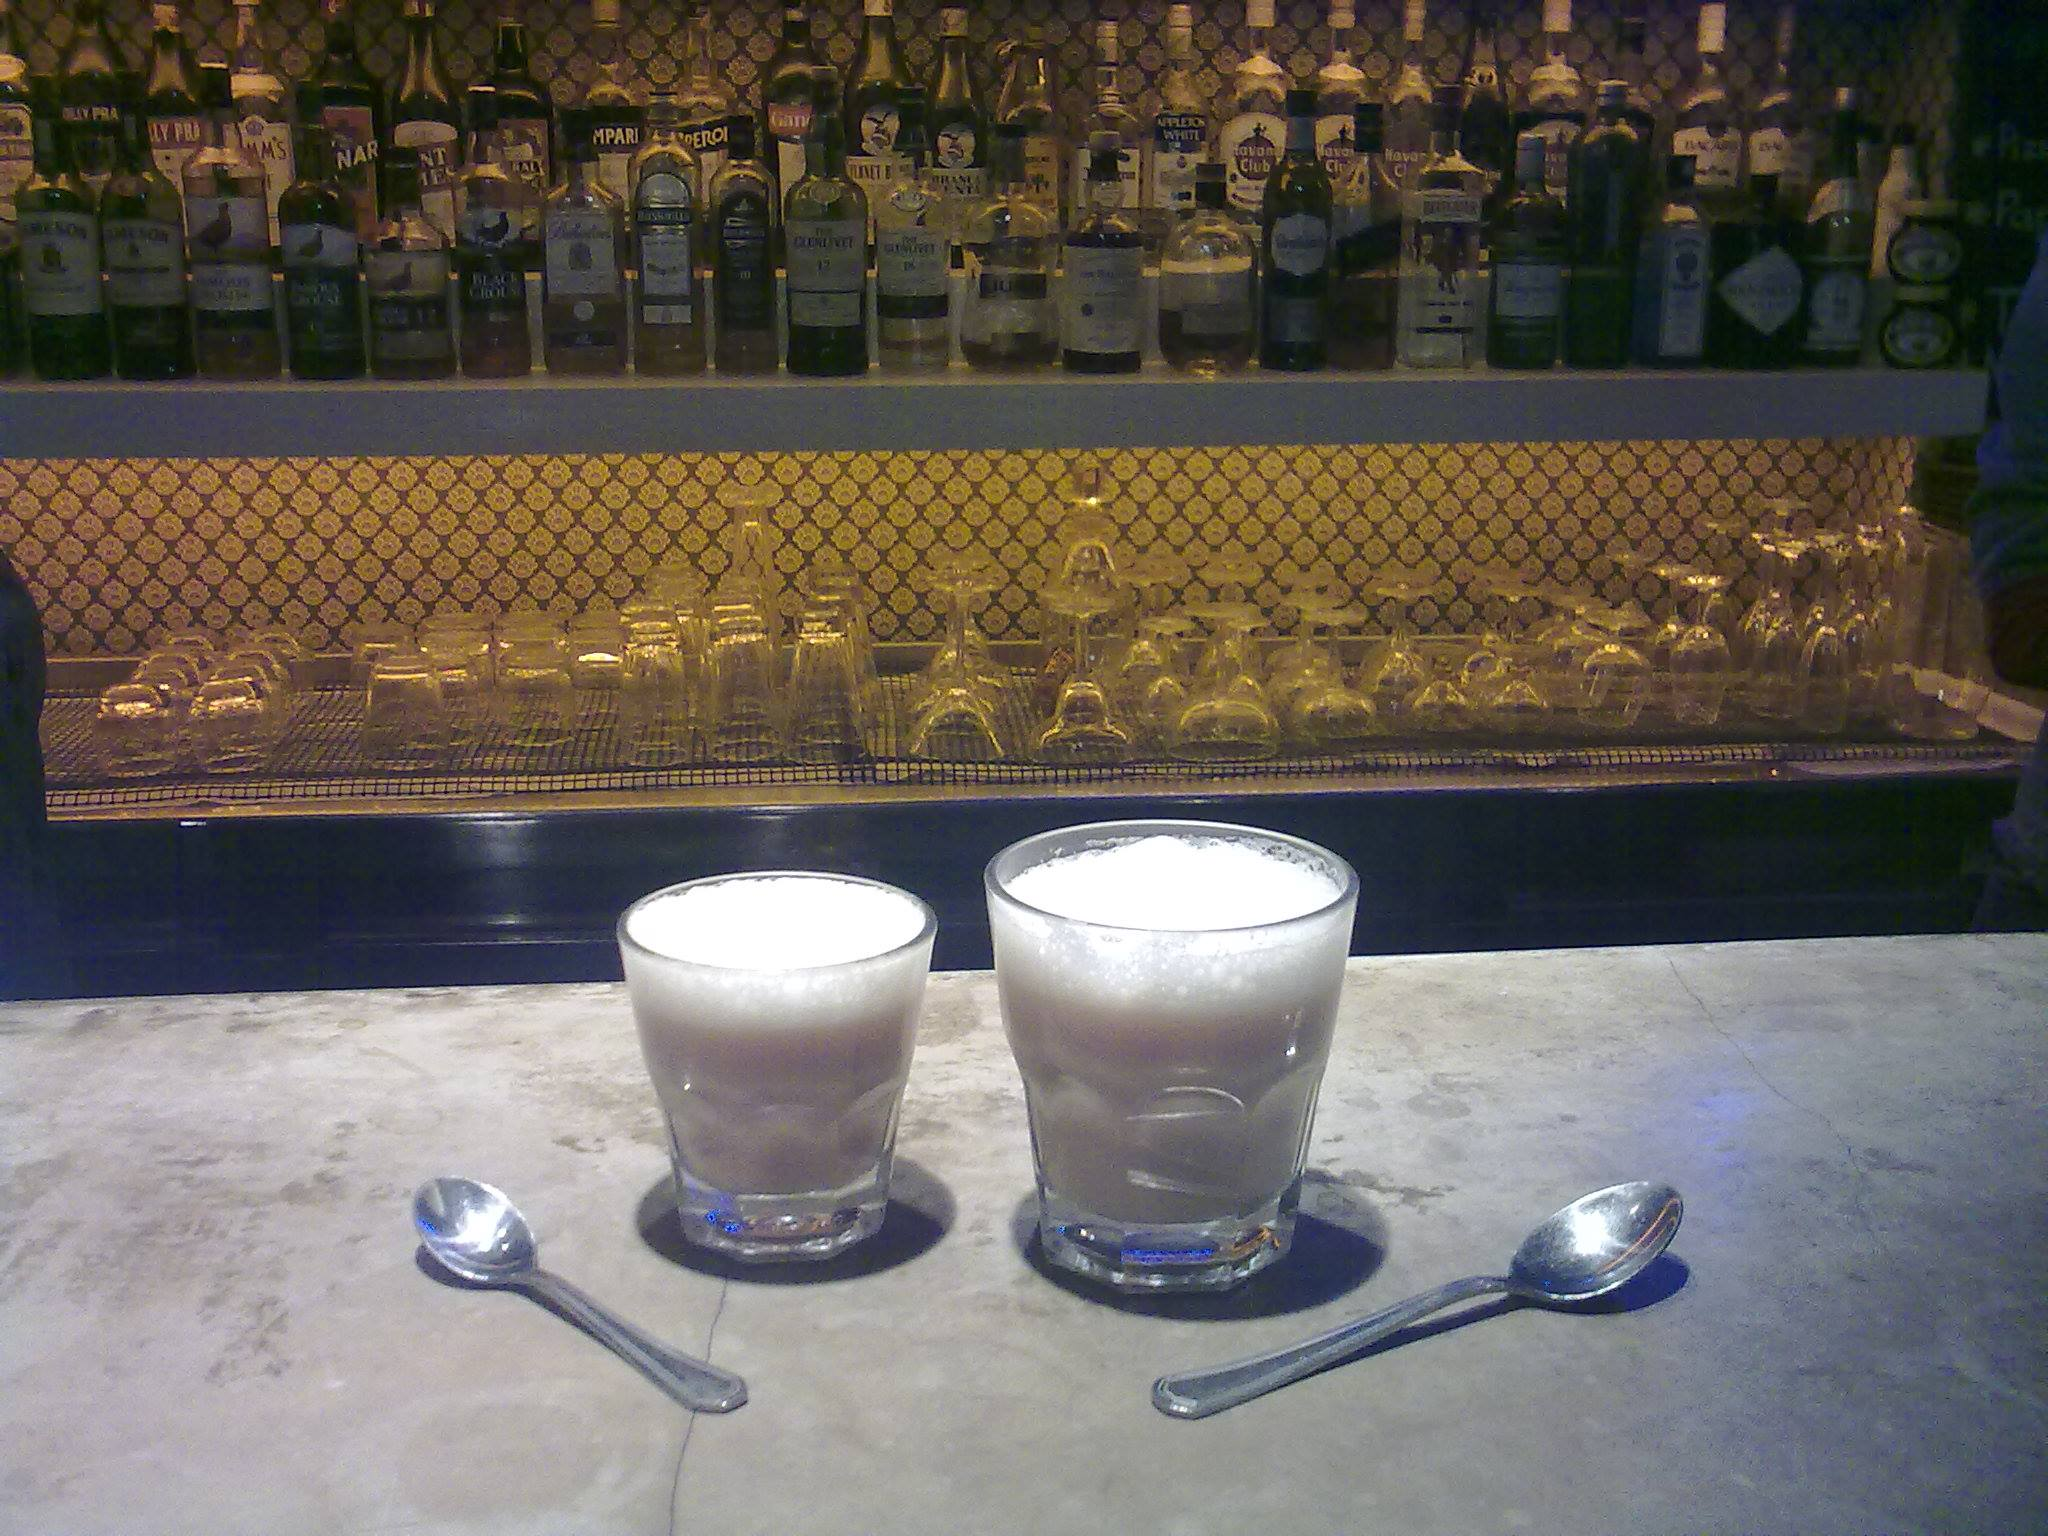 Chai latte - Home buenos aires